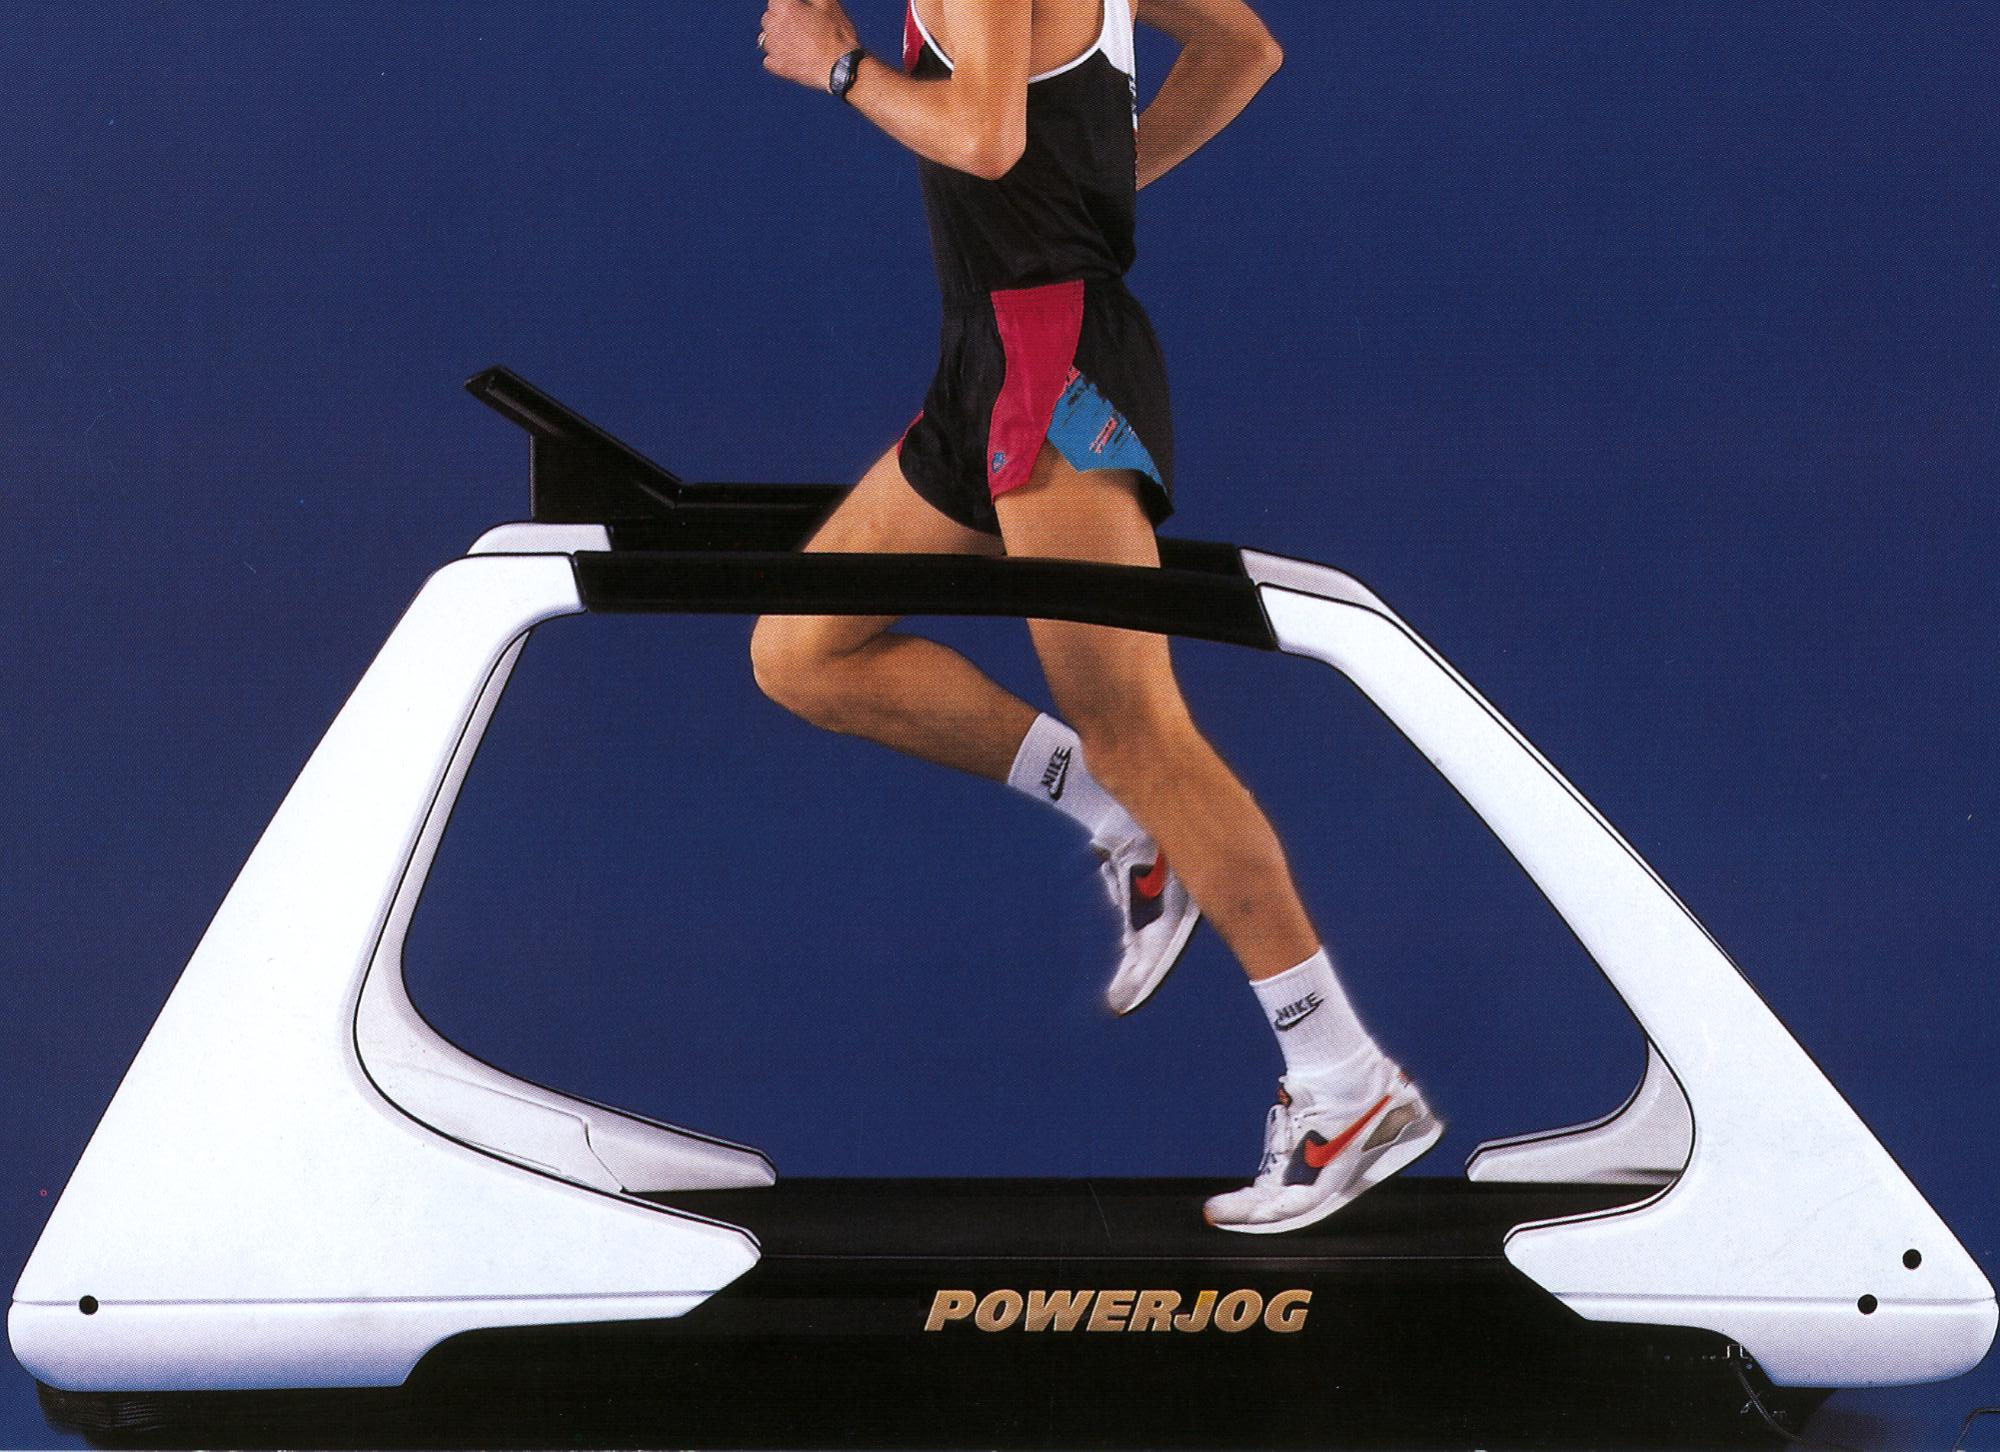 Treadmill Electric Powerjog